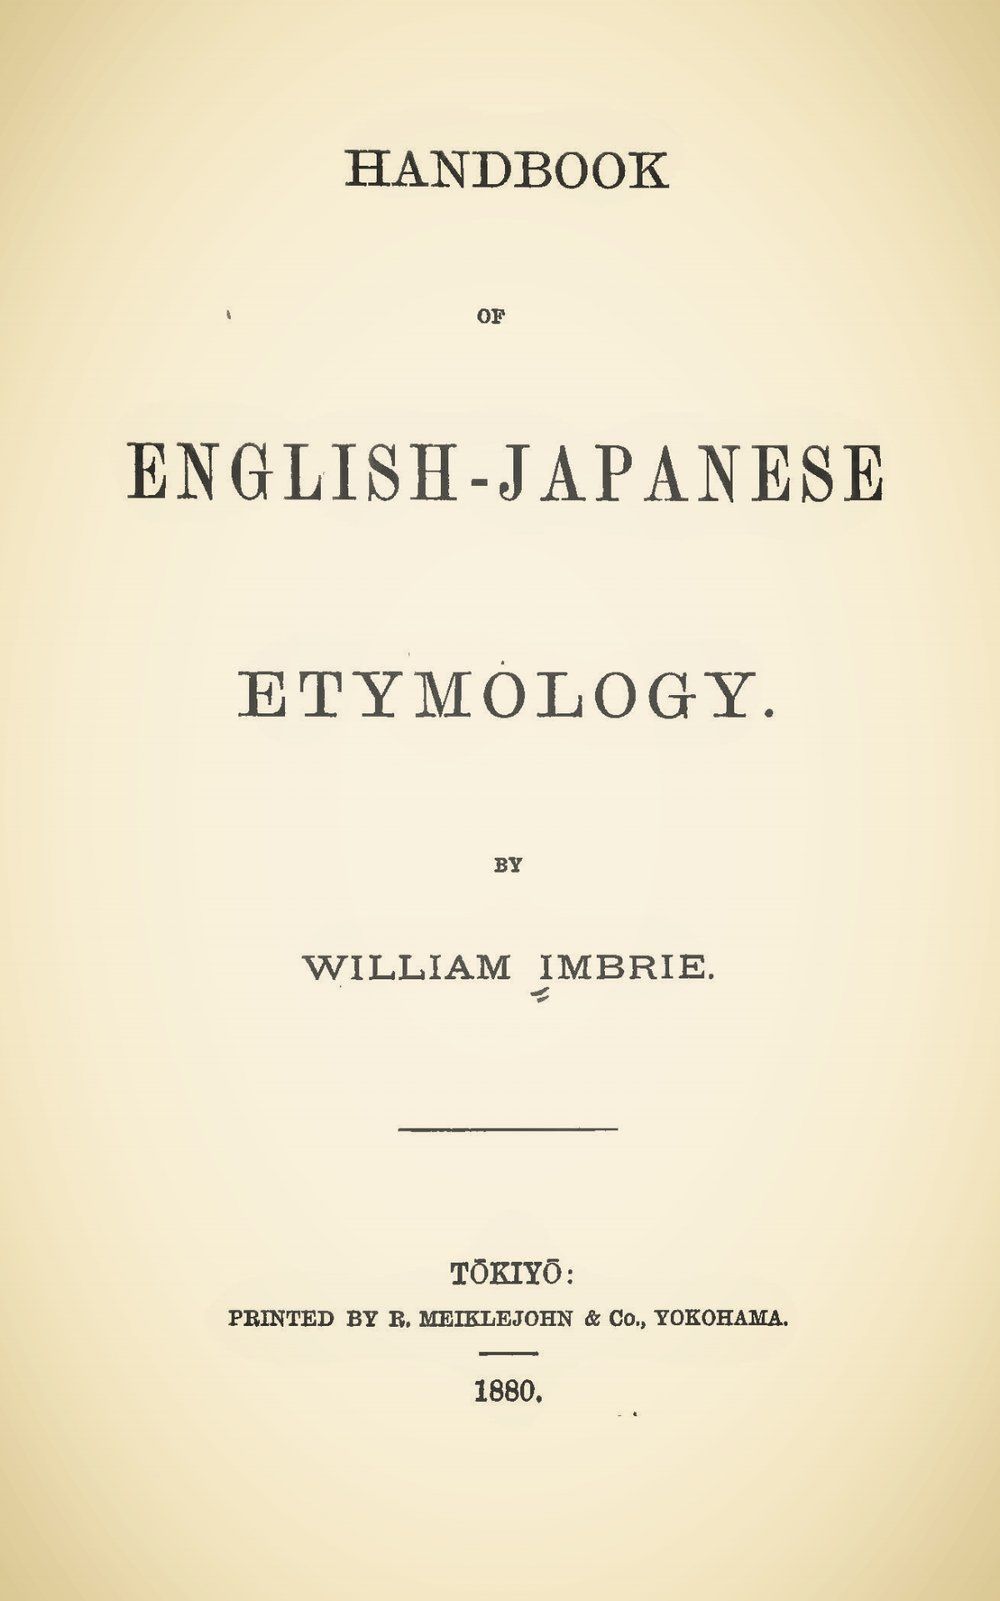 Imbrie, William, Handbook of English-Japanese Etymology Title Page.jpg